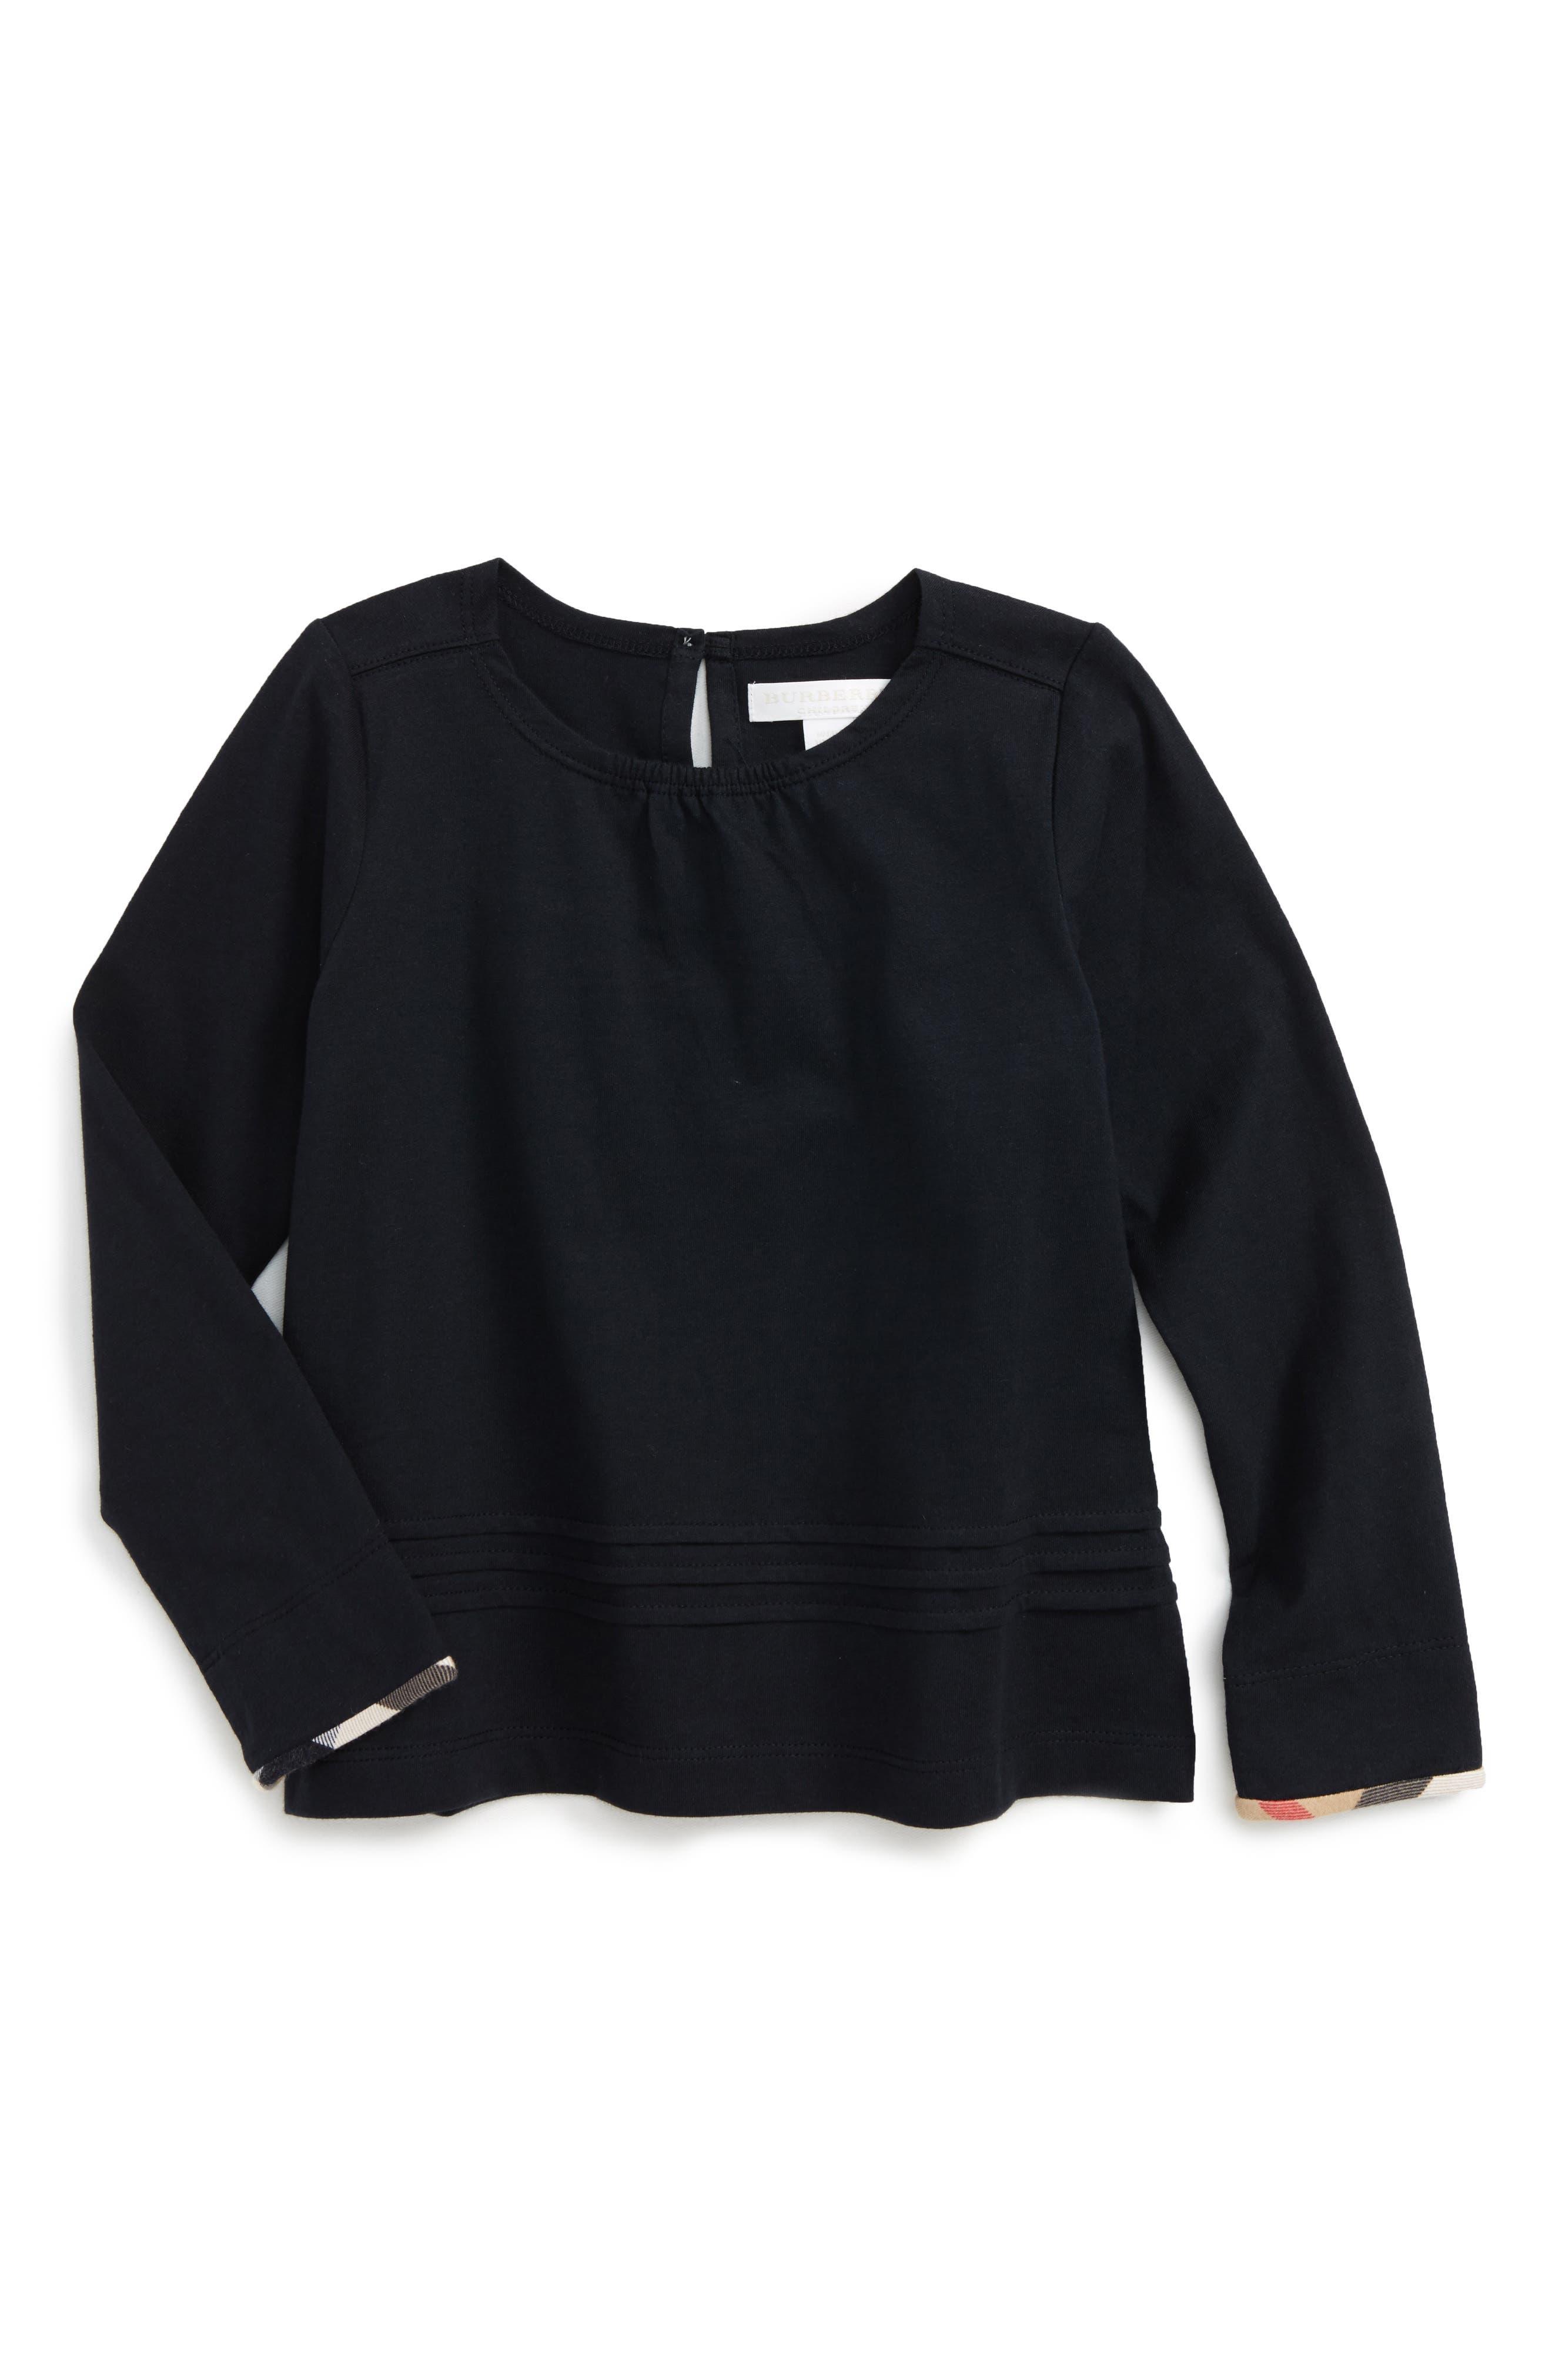 Gisselle Cotton Top,                         Main,                         color, 410